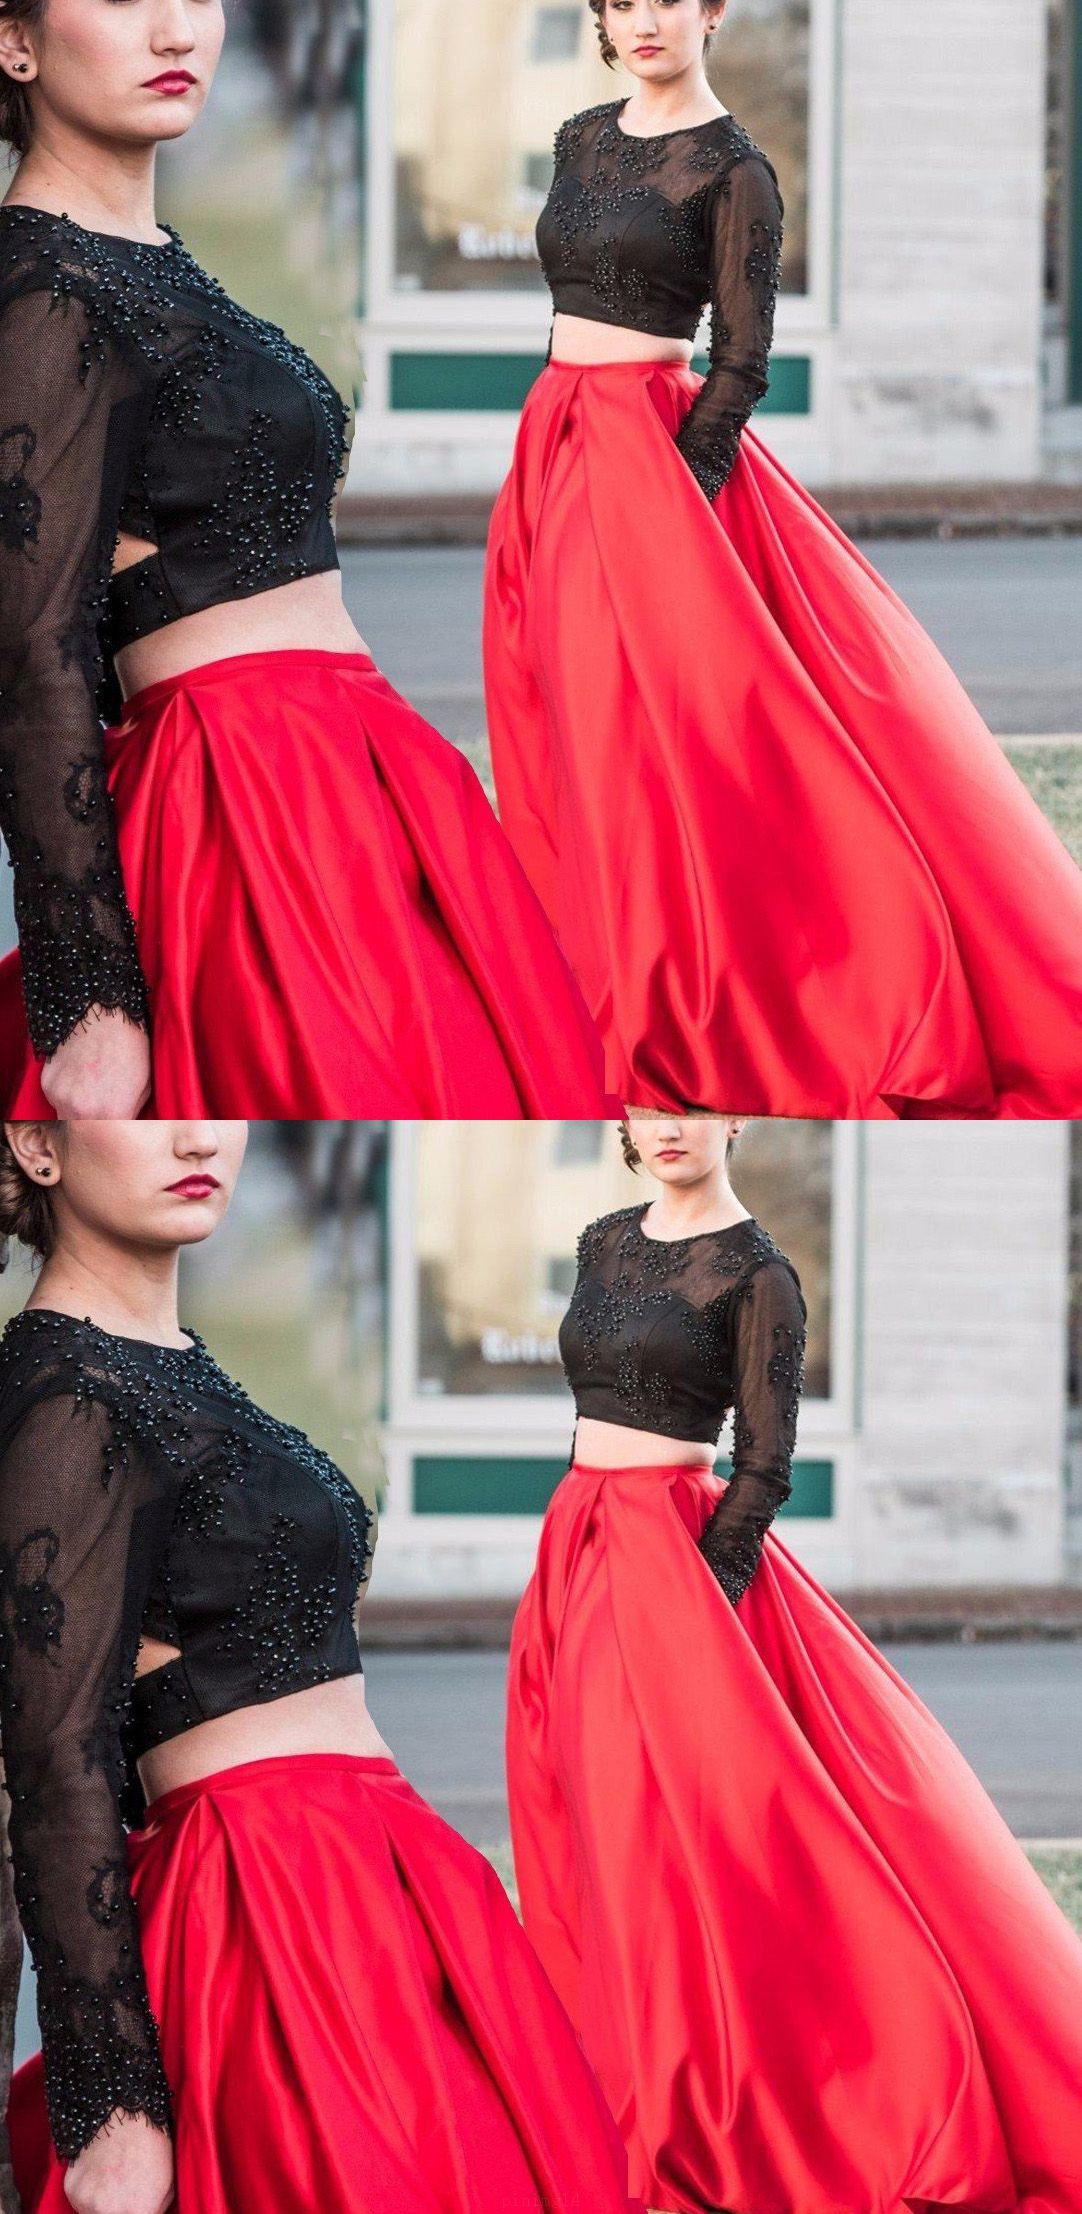 Black prom dresses long sleeve prom dresses long prom dresses